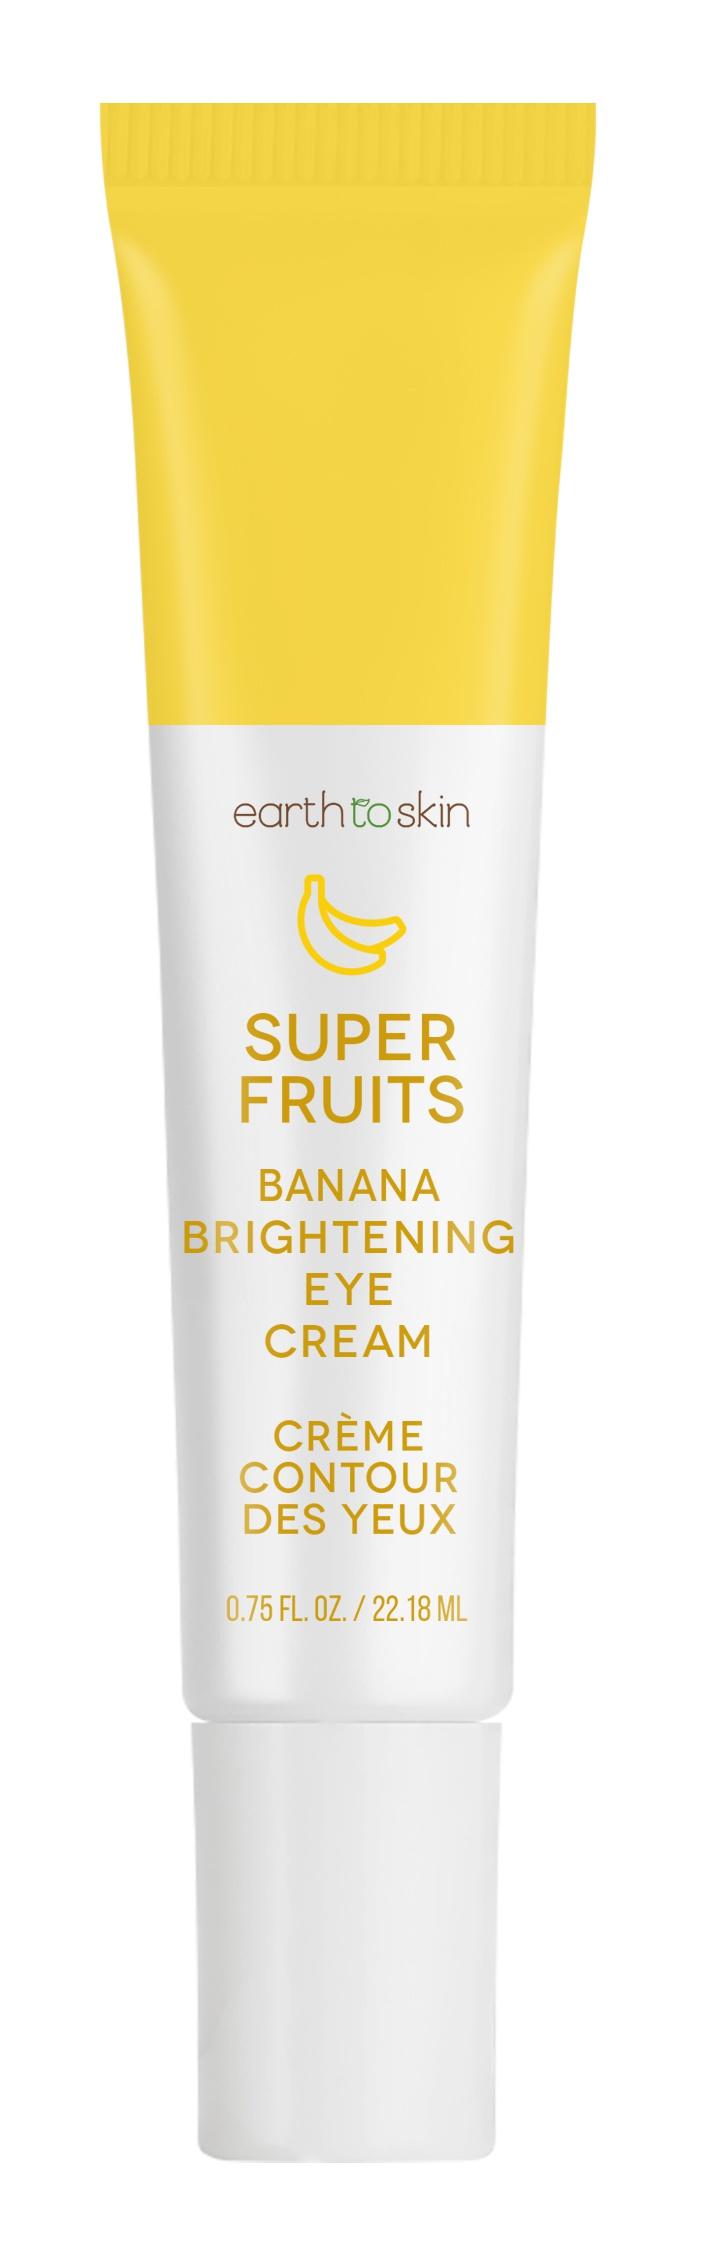 Earth To Skin Super Fruits Banana Brightening Eye Cream